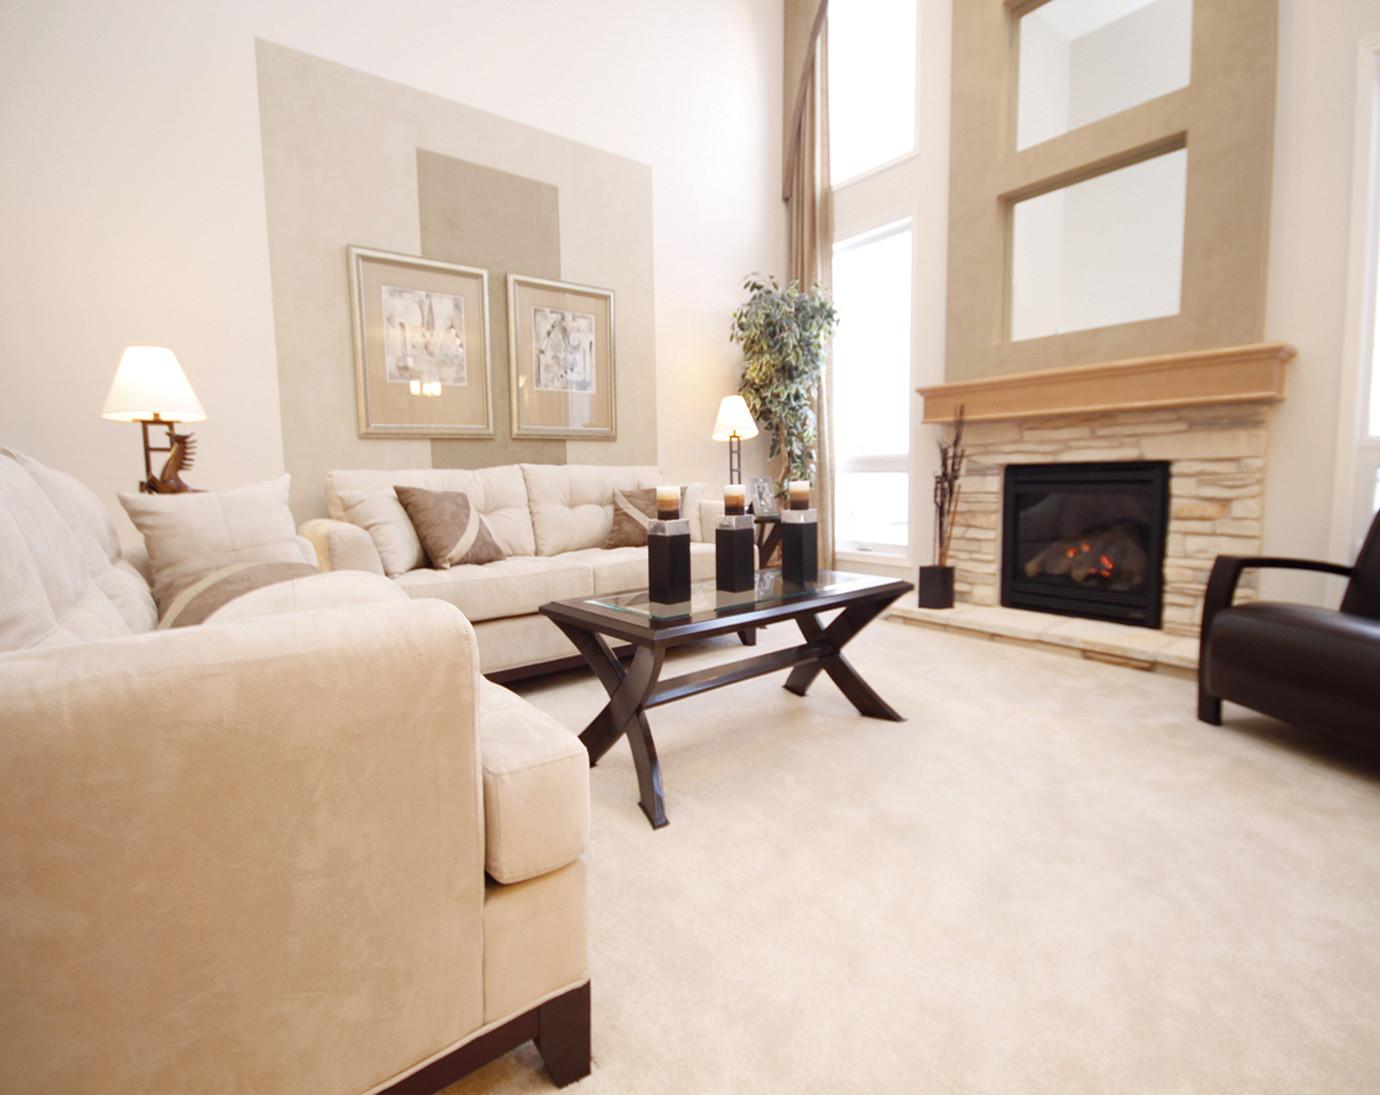 Best ideas about Living Room Carpet . Save or Pin Living Room Carpet 1 Inspiring Design EnhancedHomes Now.